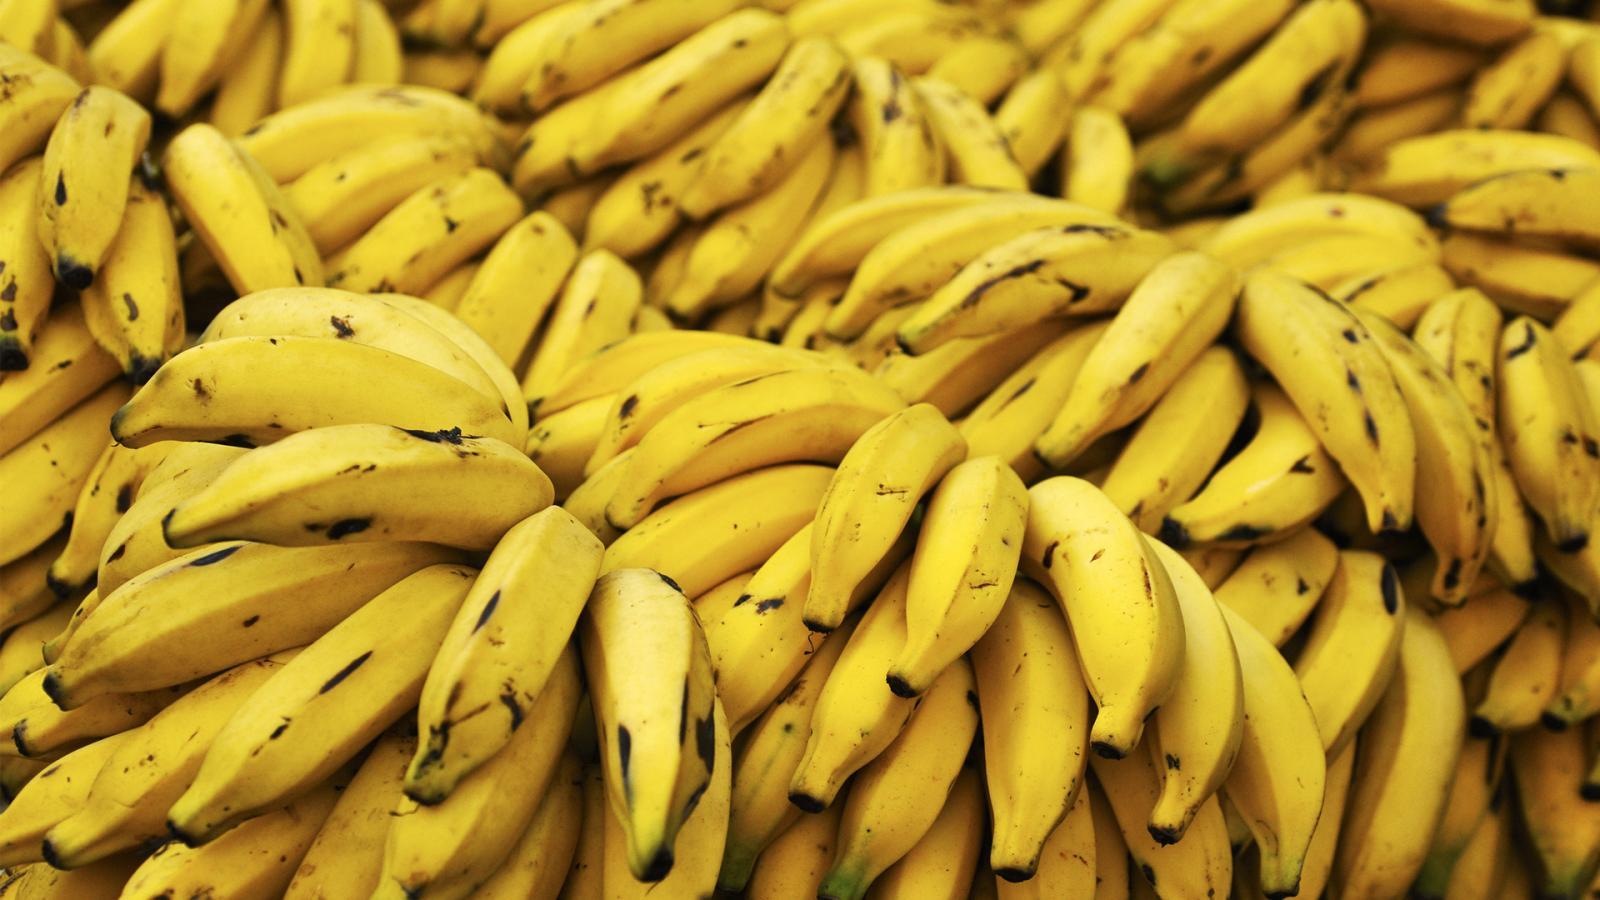 yellow fruits bananas HD 169 1280x720 1366x768 1600x900 1920x1080 1600x900